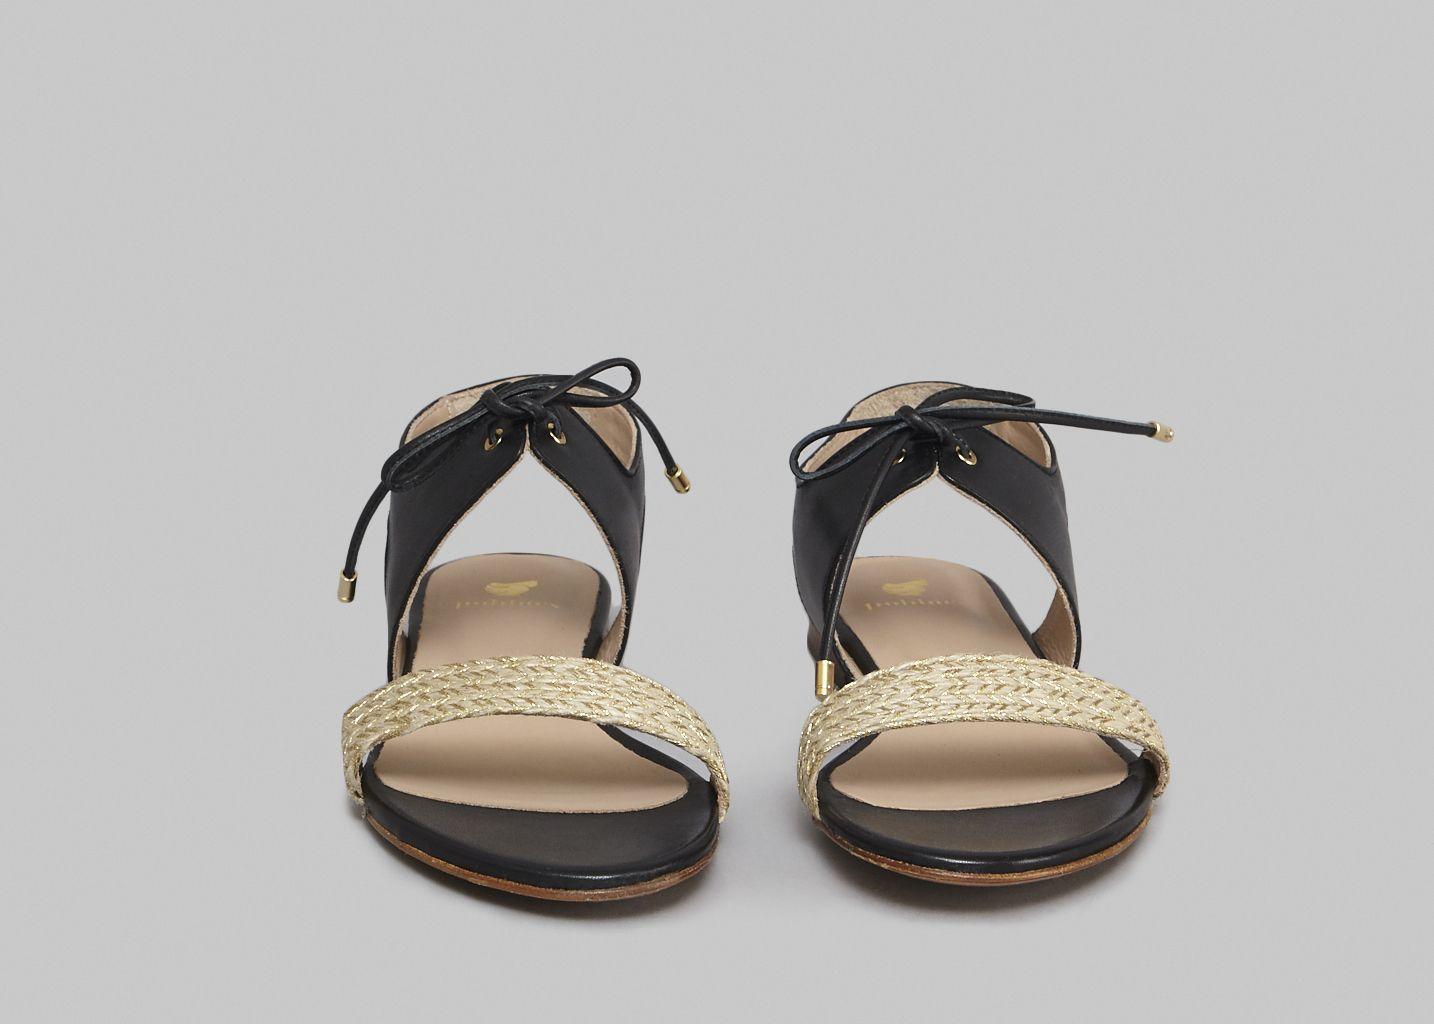 Sandales La Friponne - Bobbies